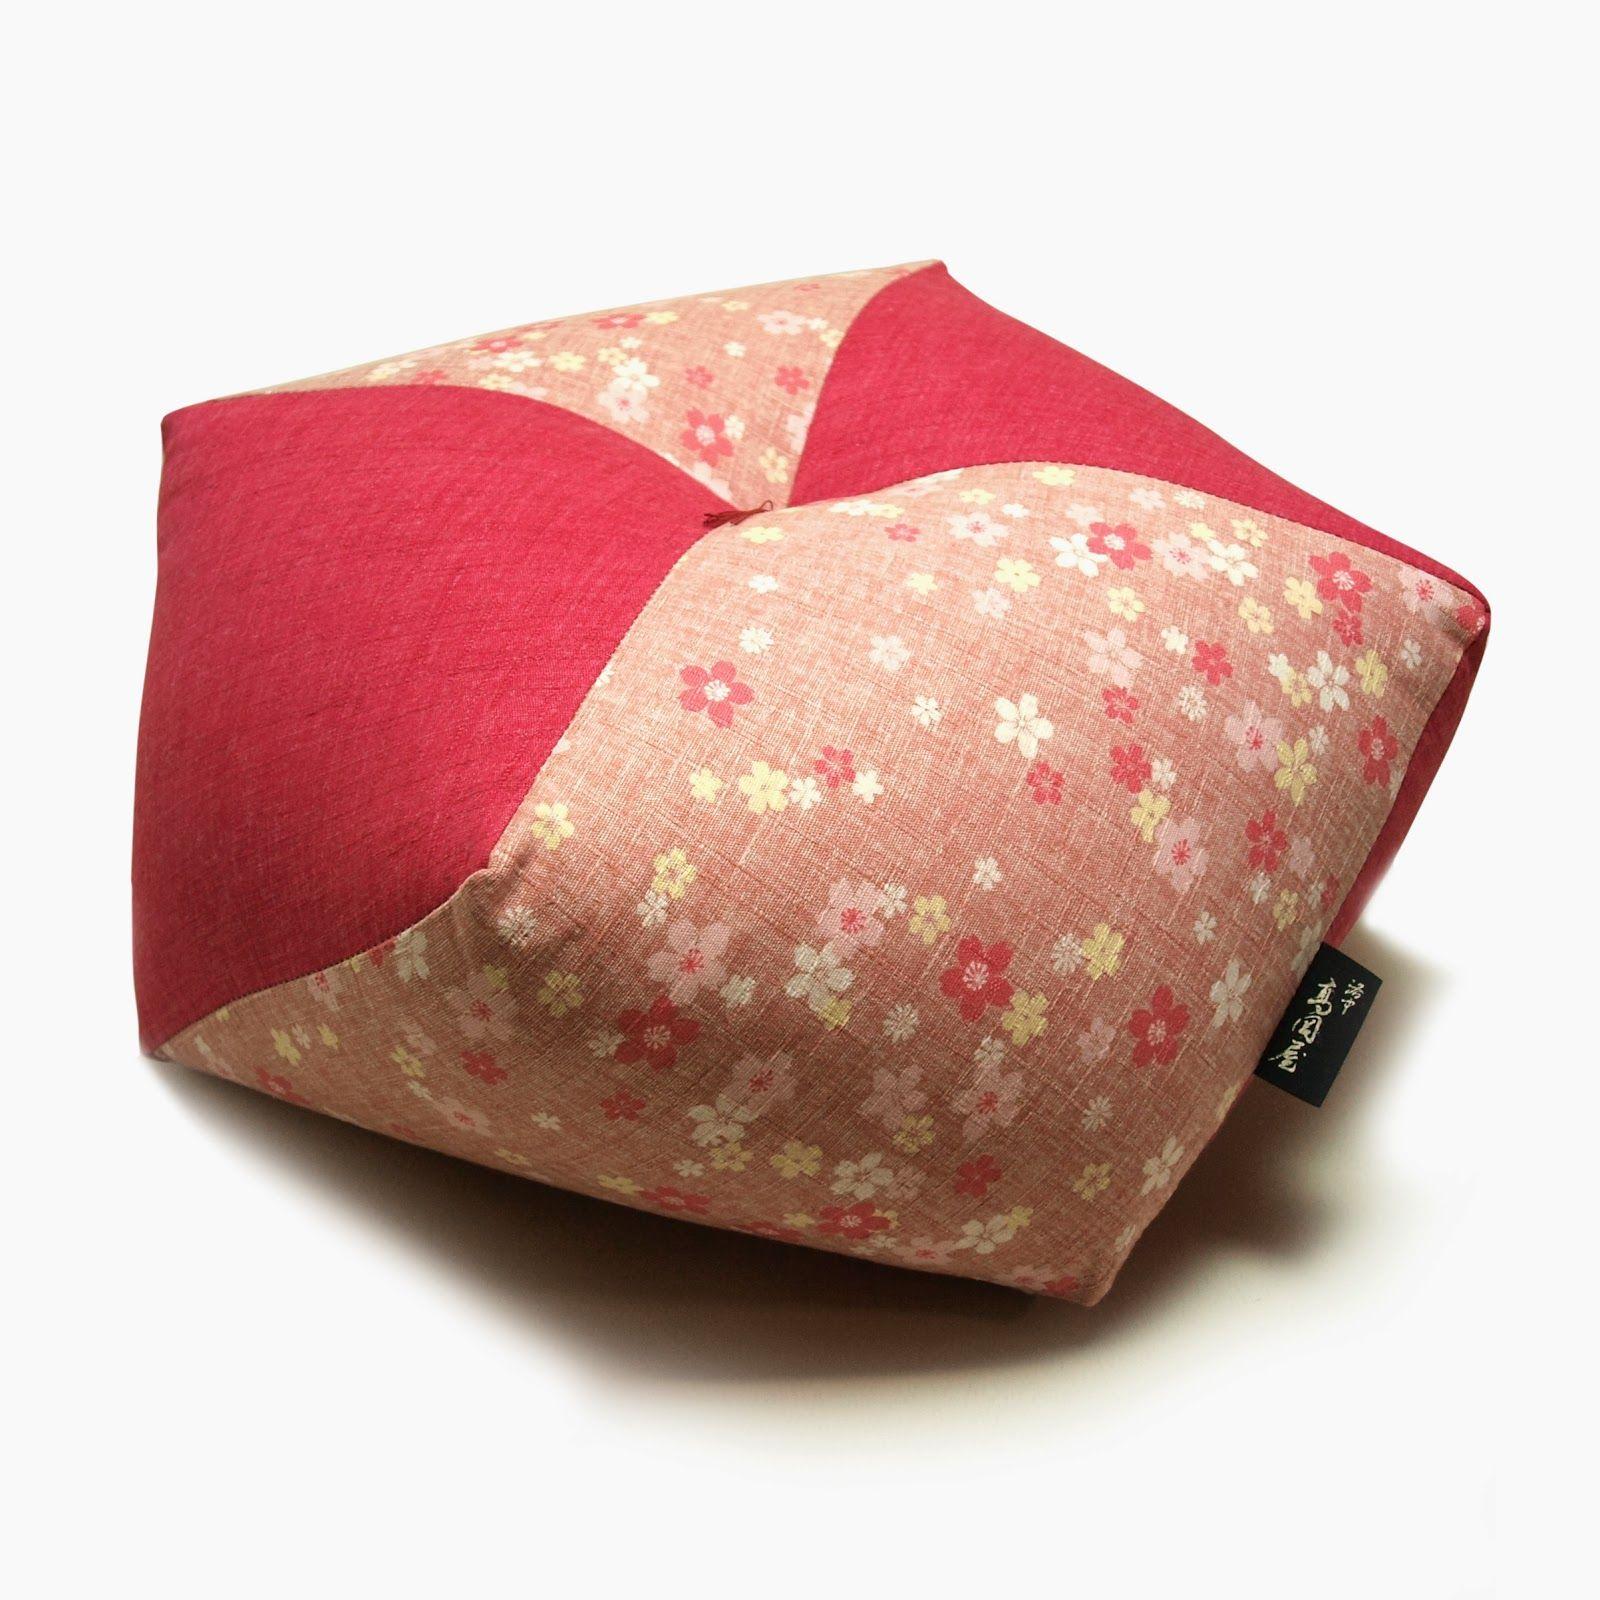 Sakura Ojami Japanese Meditation Cushion, Floor cushion #sakura #Japanese #MeditationCushion #FloorCushion